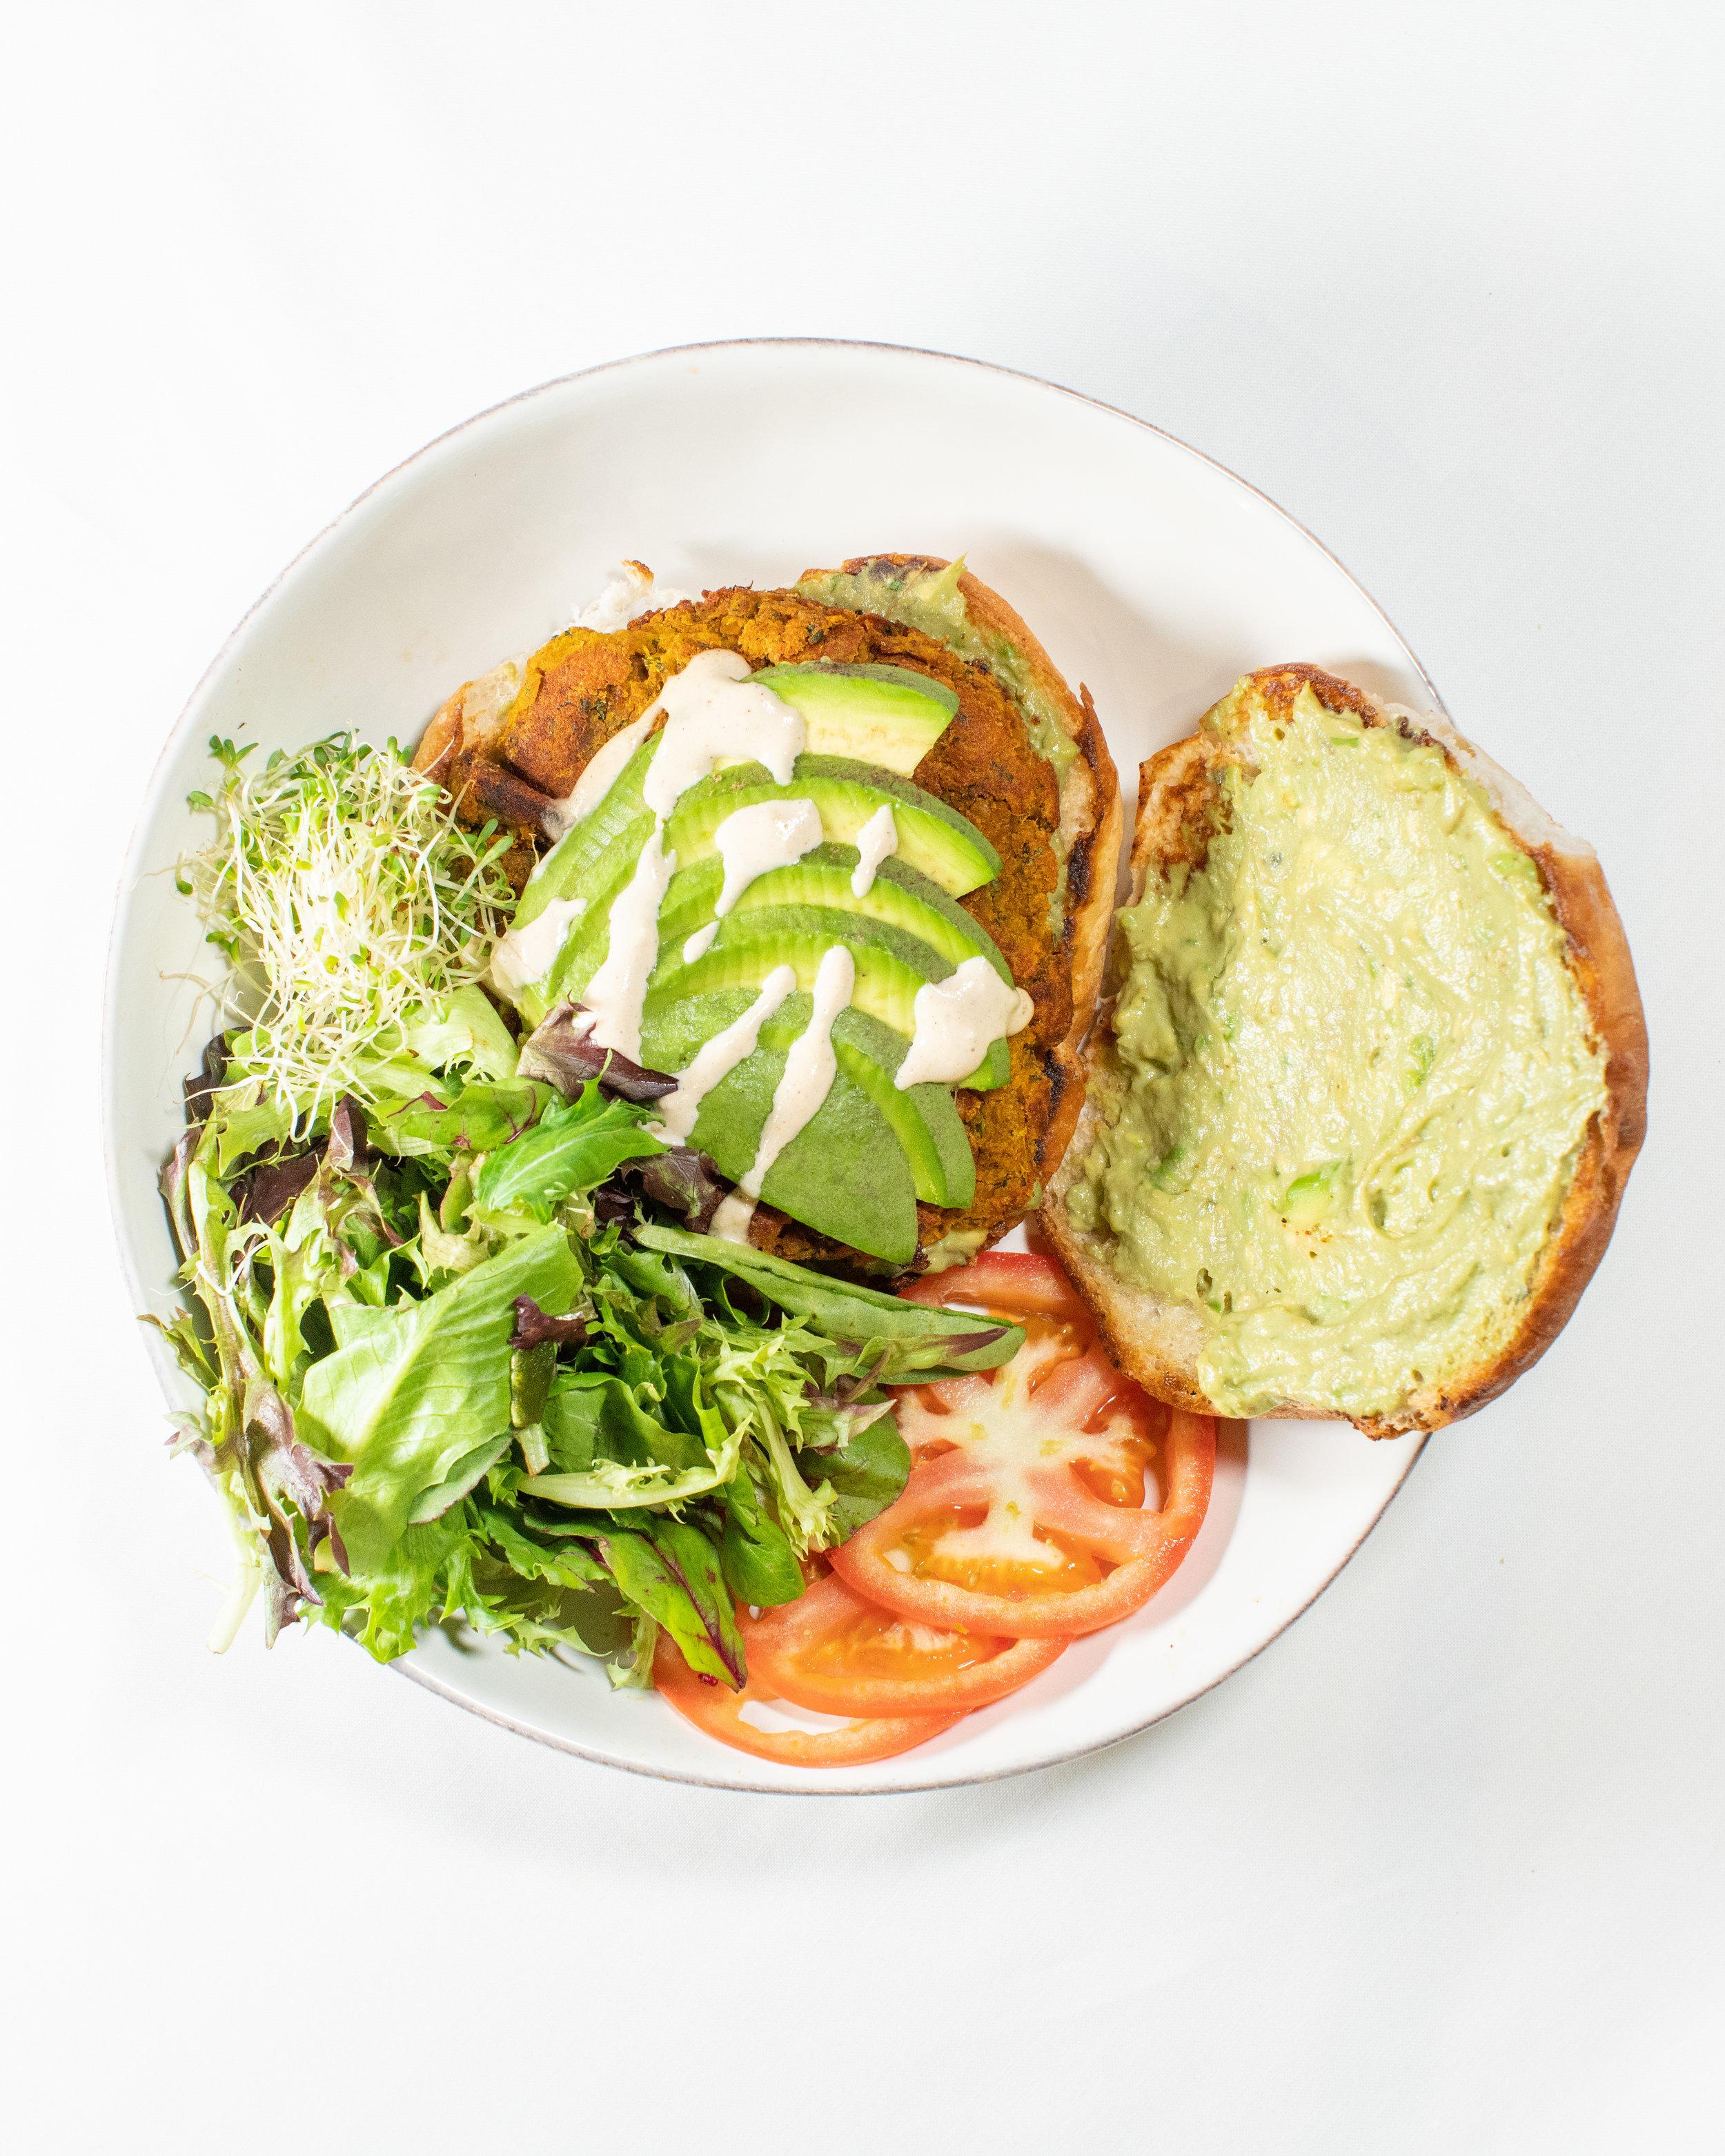 Fala Bar Avocado Burger